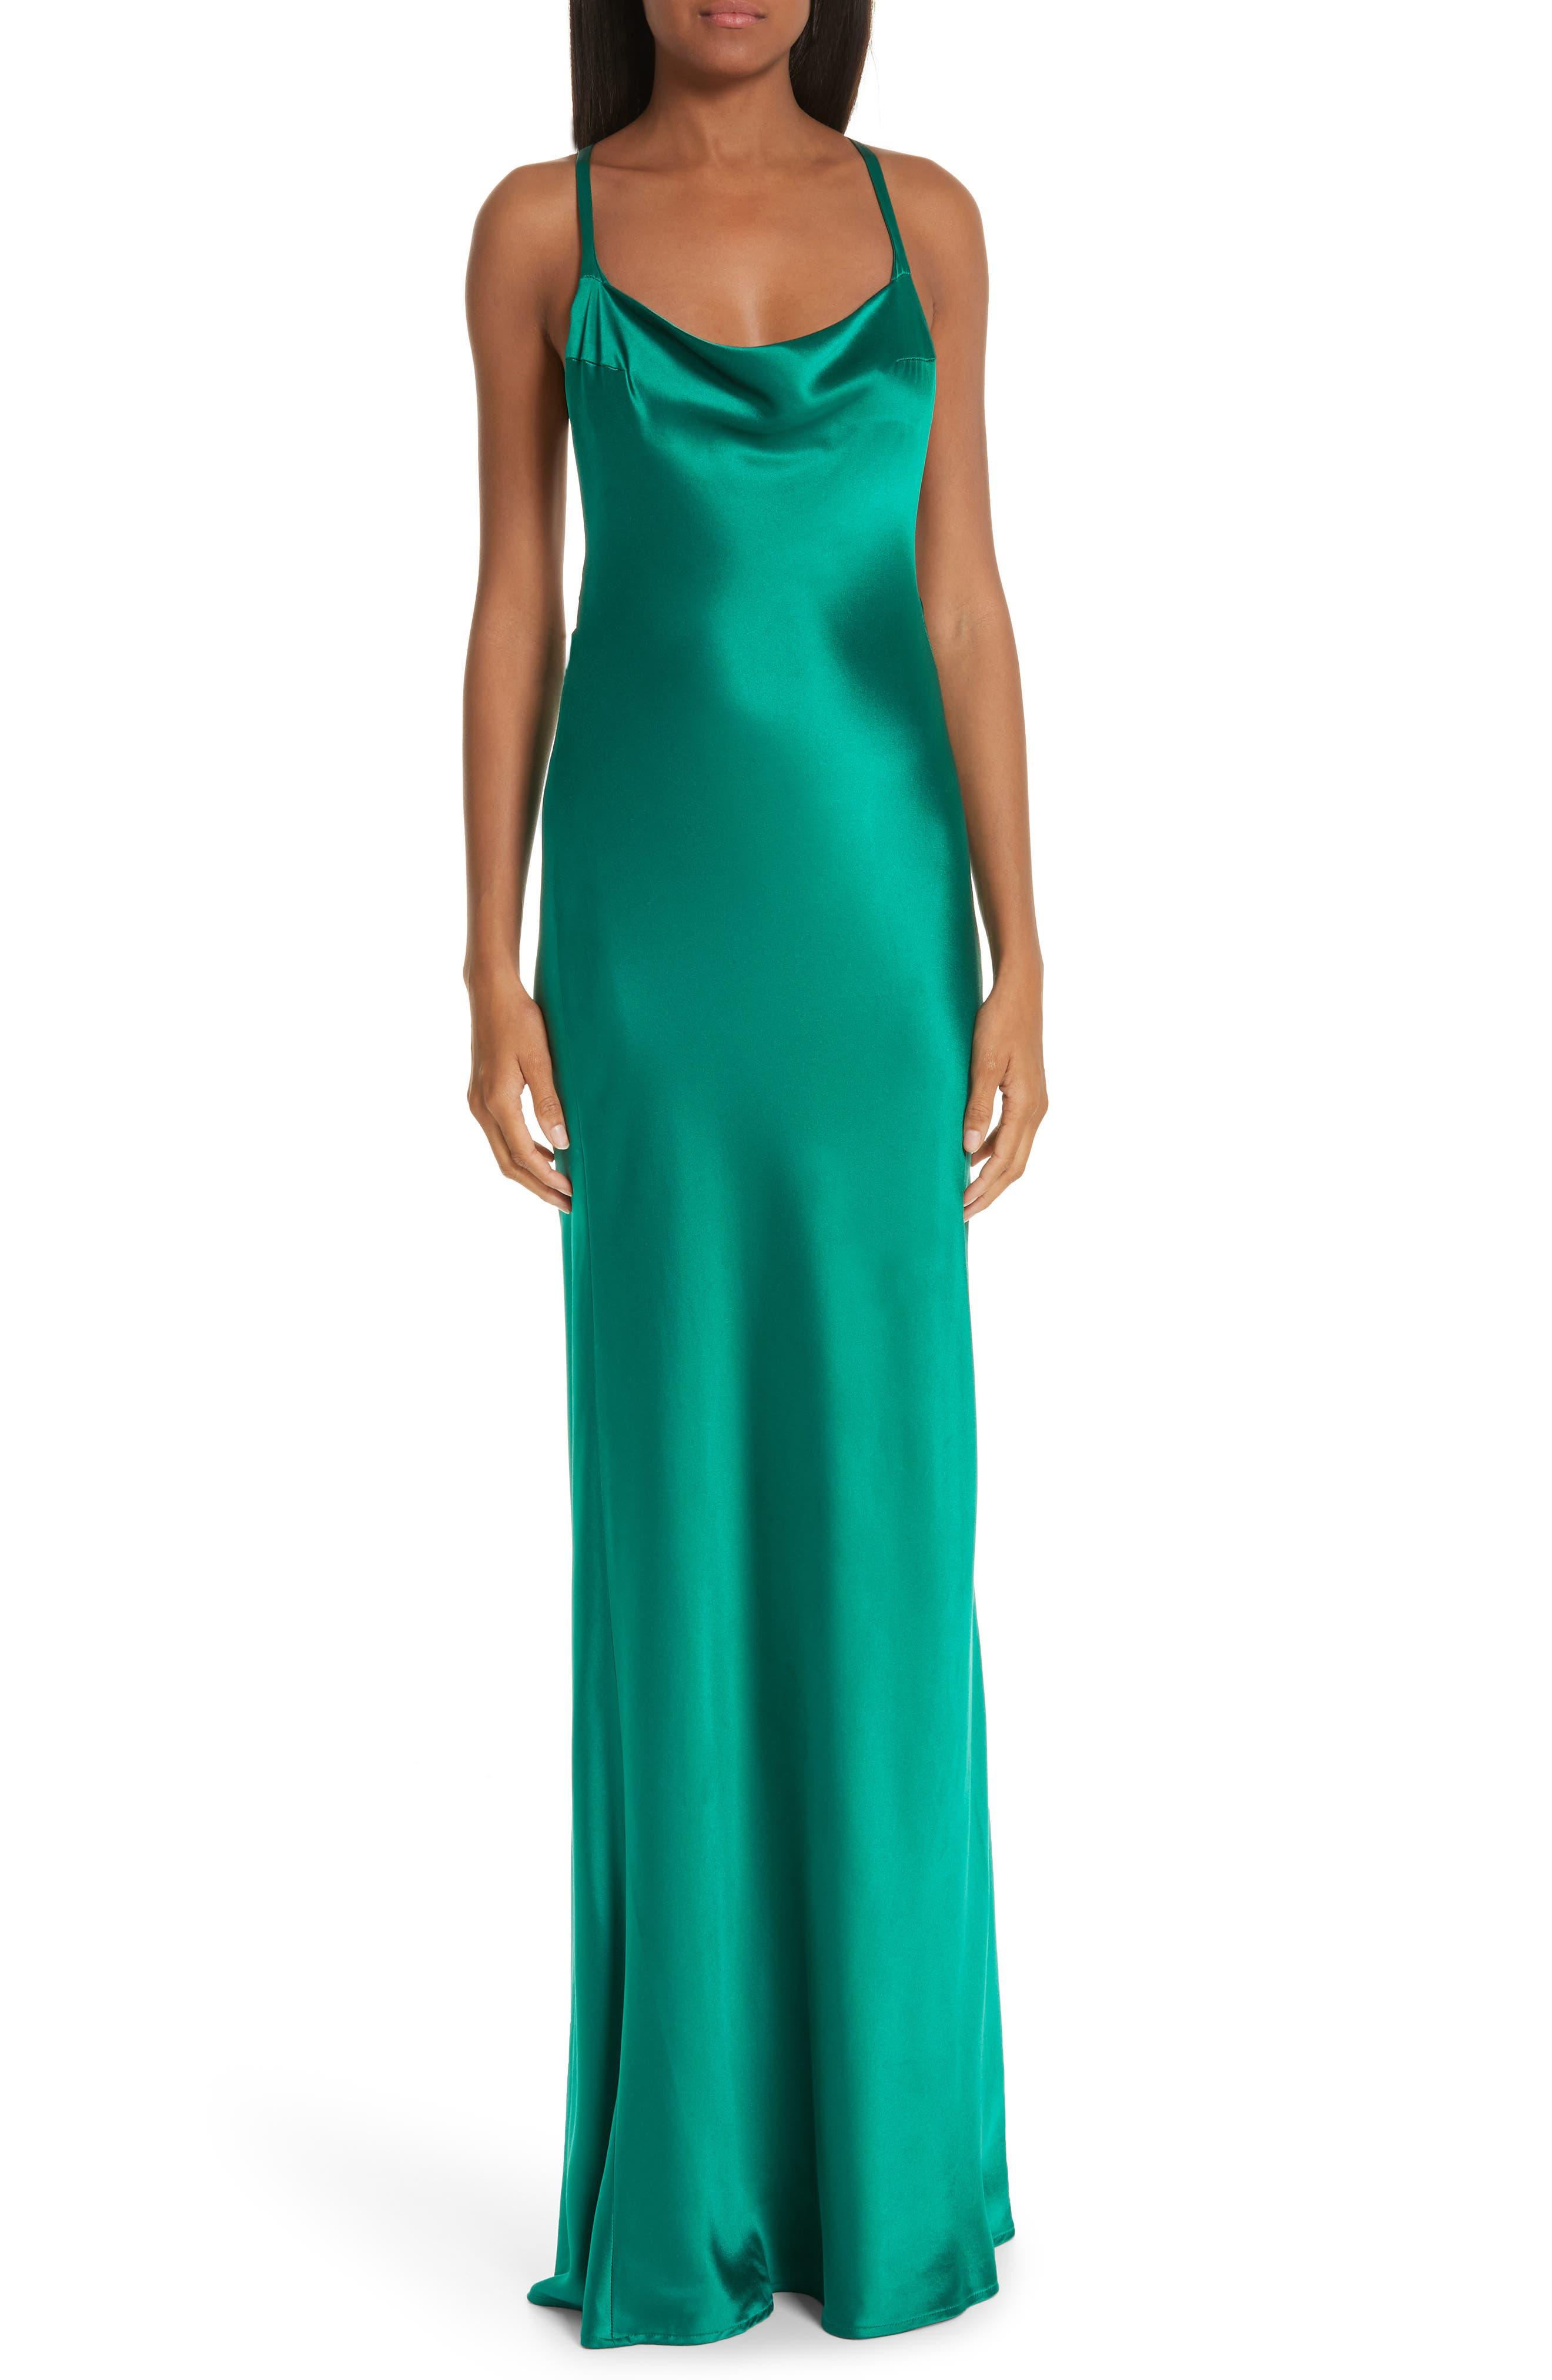 Galvan Cross Back Silk Satin Dress, 8 FR - Green